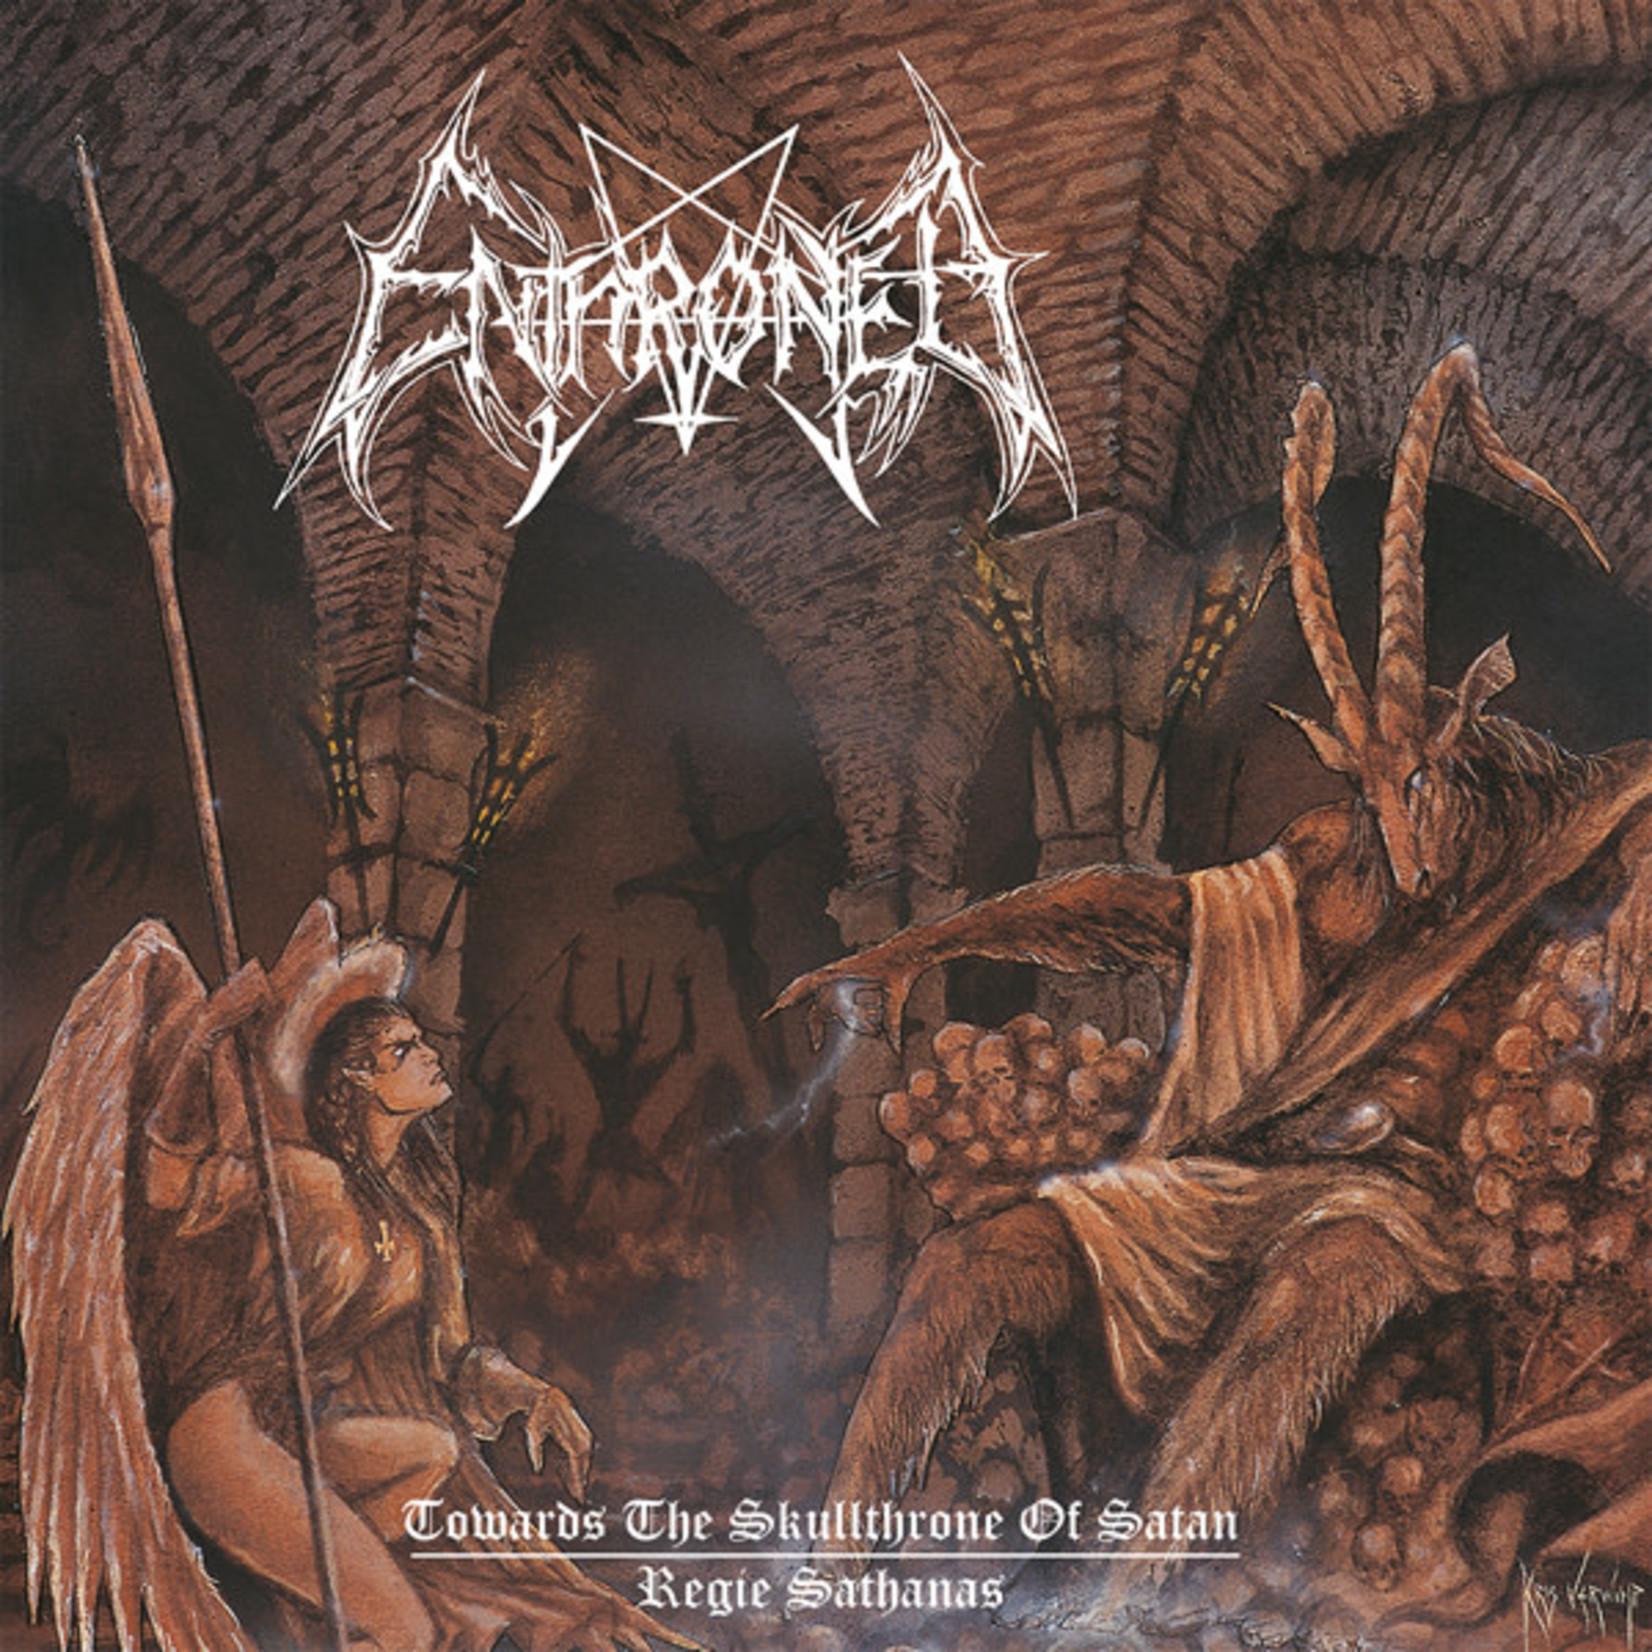 [New] Enthroned: Towards The Skullthrone Of Satan/Regie Sathanas EP (2LP, splatter vinyl)